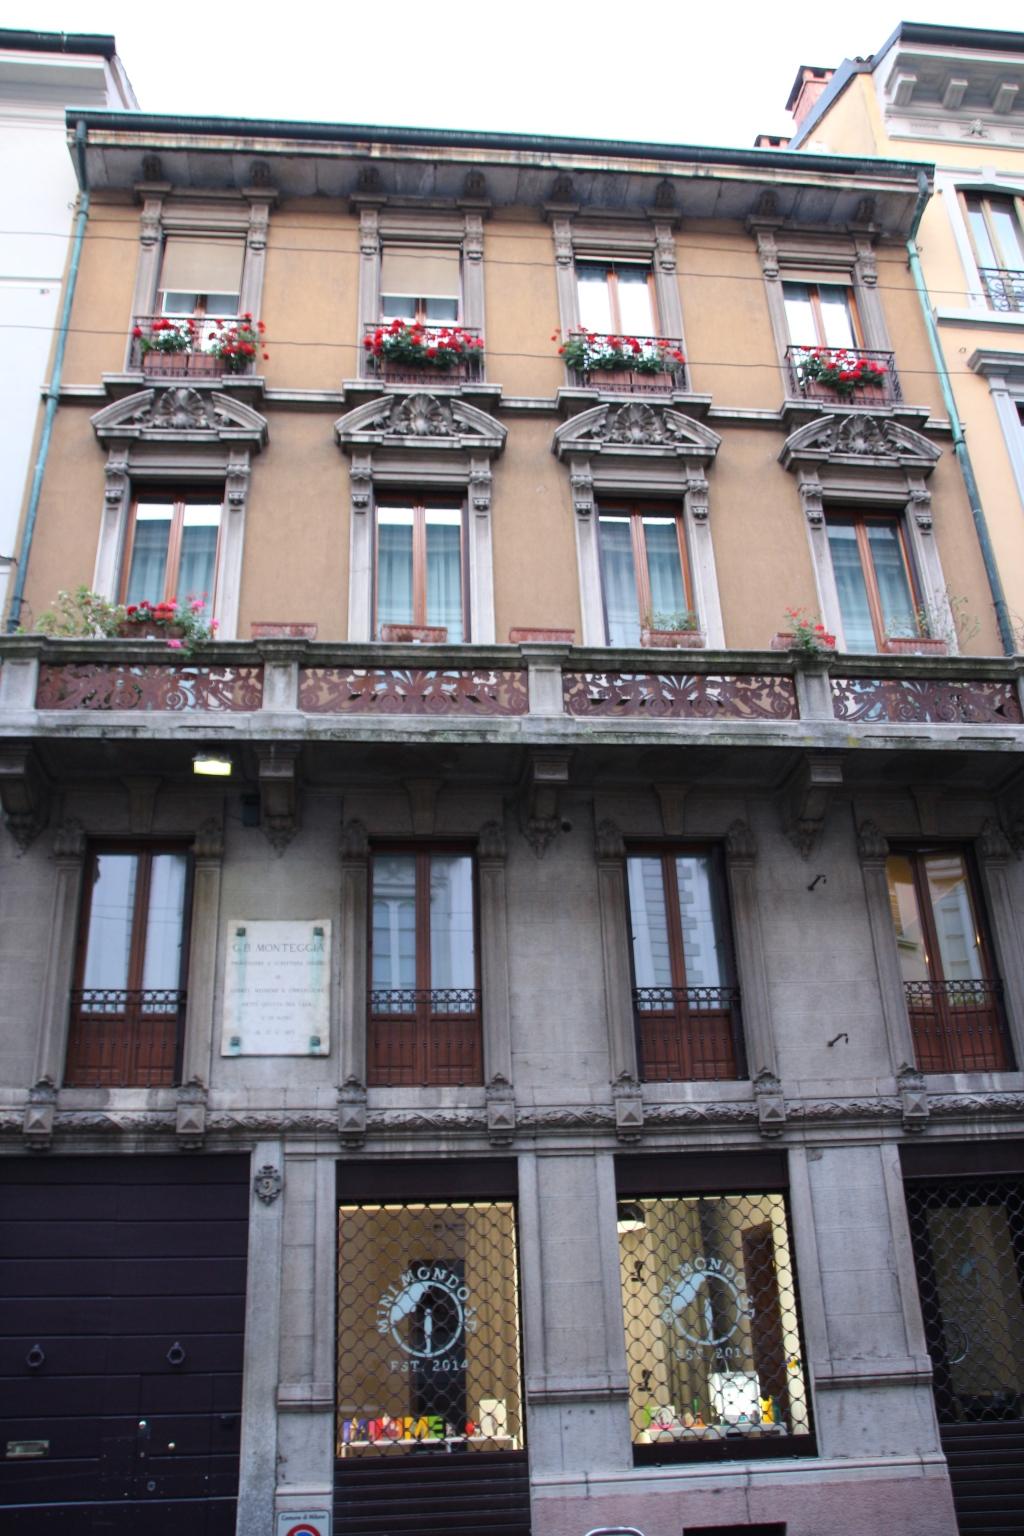 Ca' Monteggia Guest House, Milan